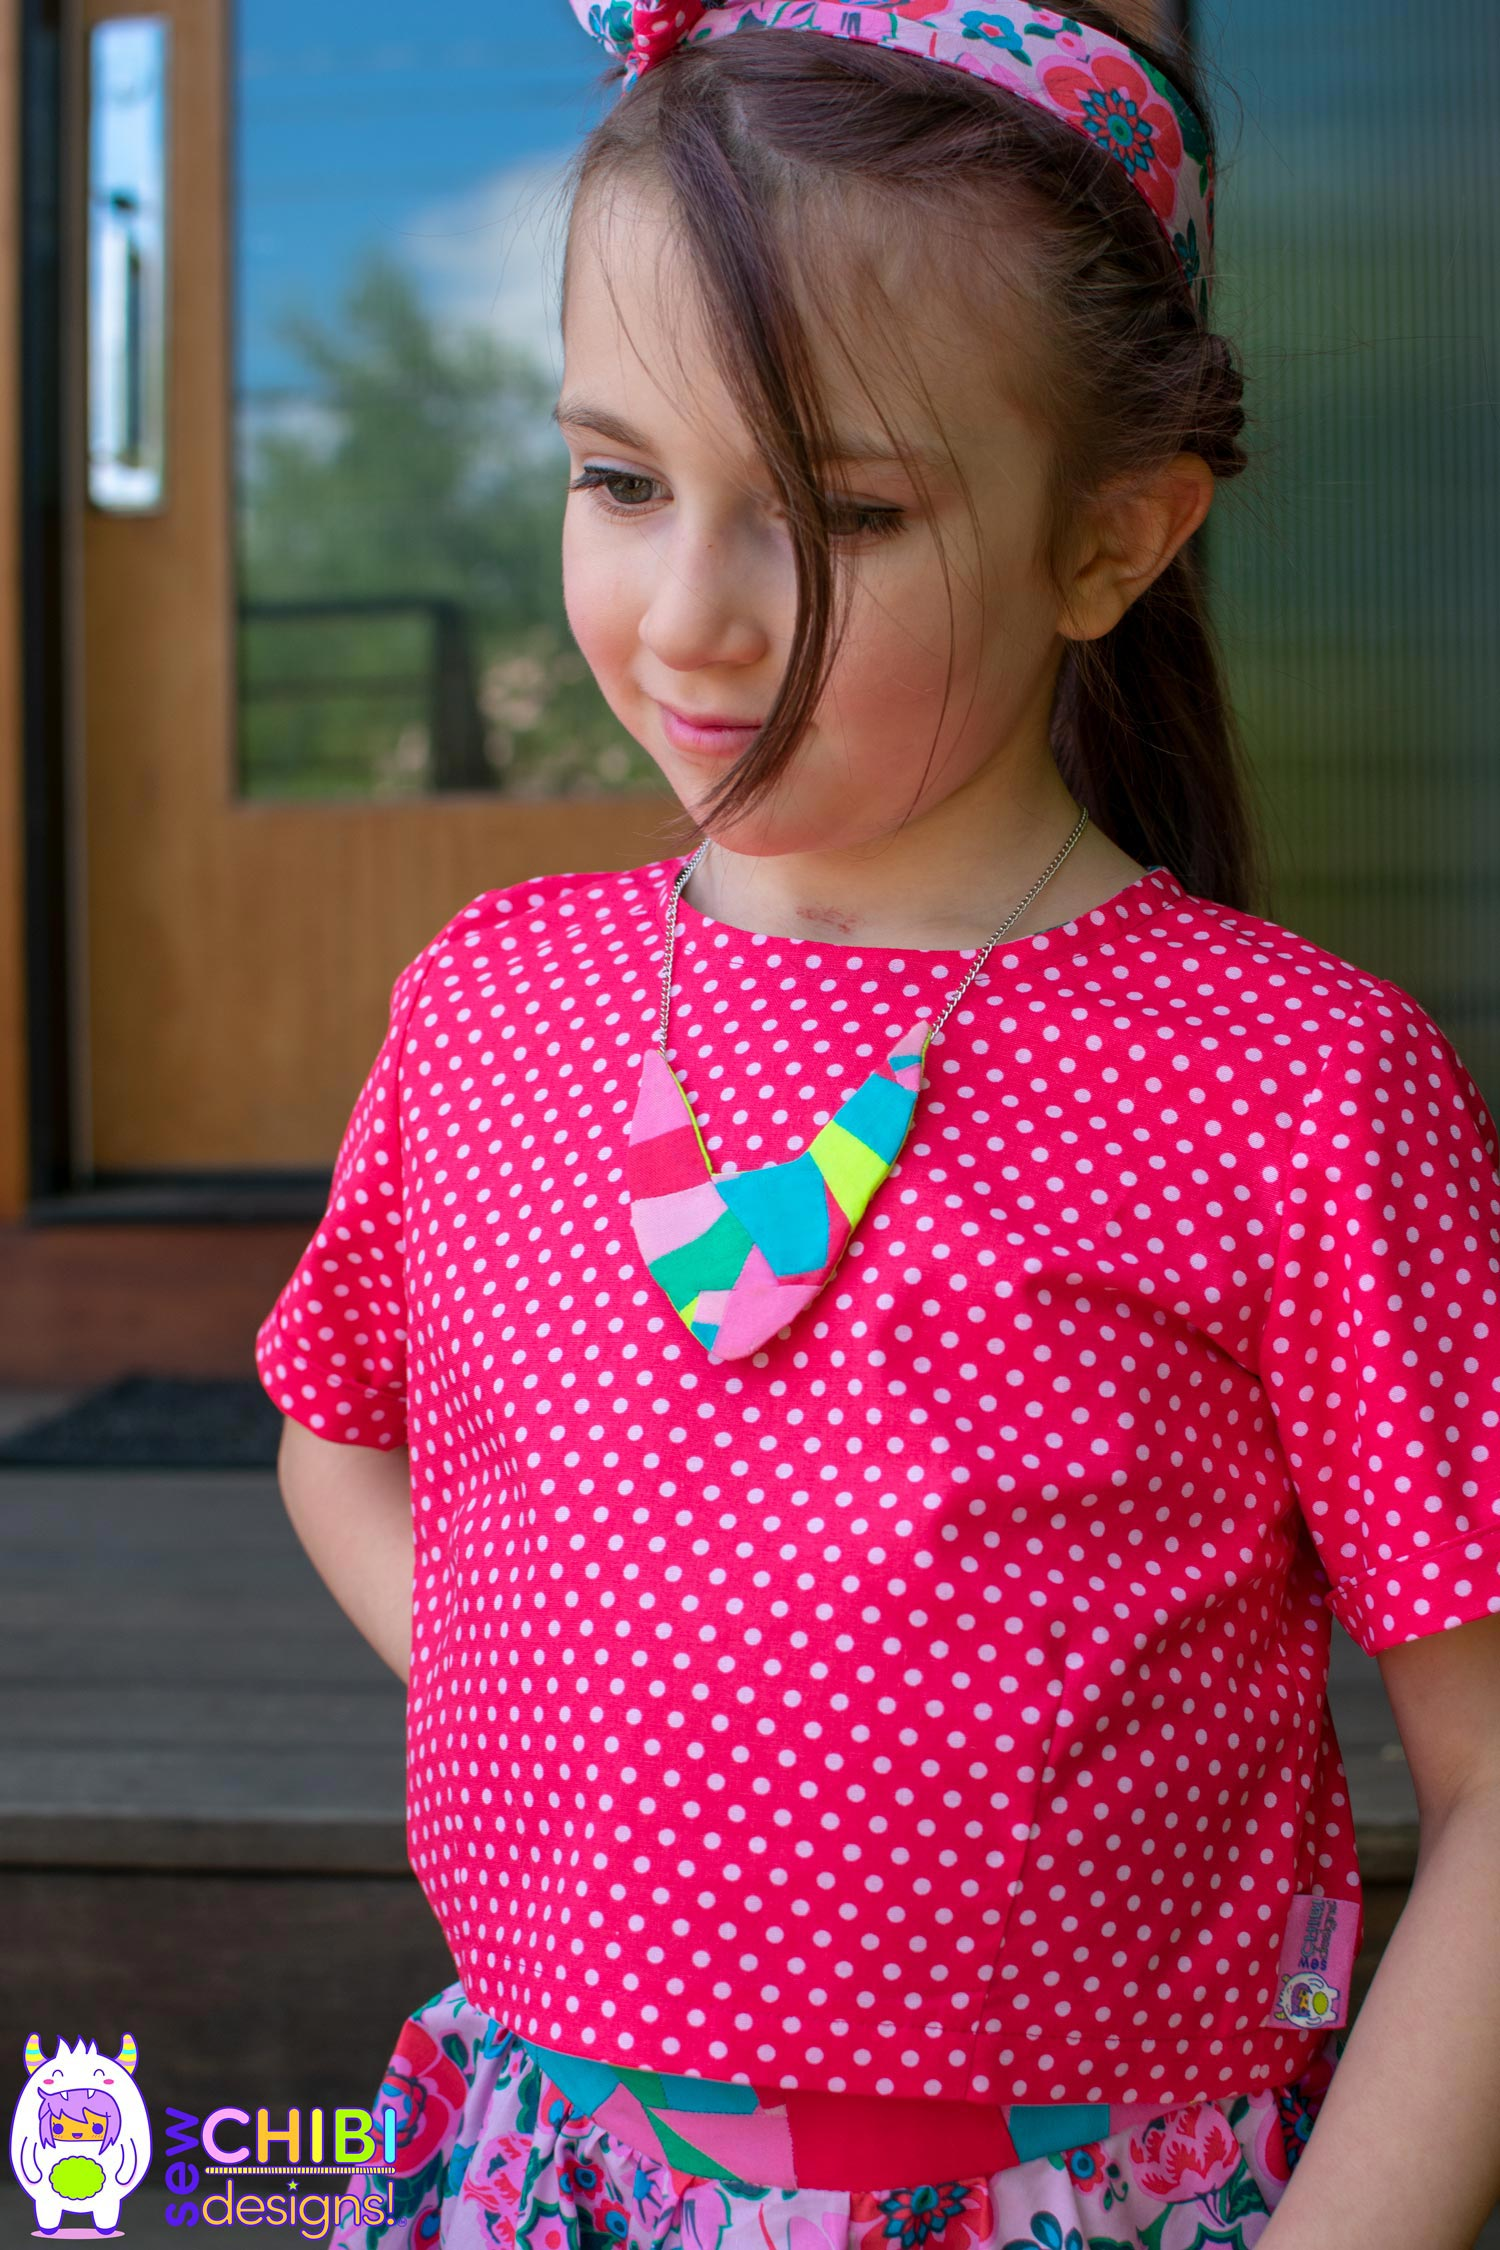 Sew-Chibi-Designs-Sew-Your-Stash-Ice-Cream-and-Sundays-19.jpg